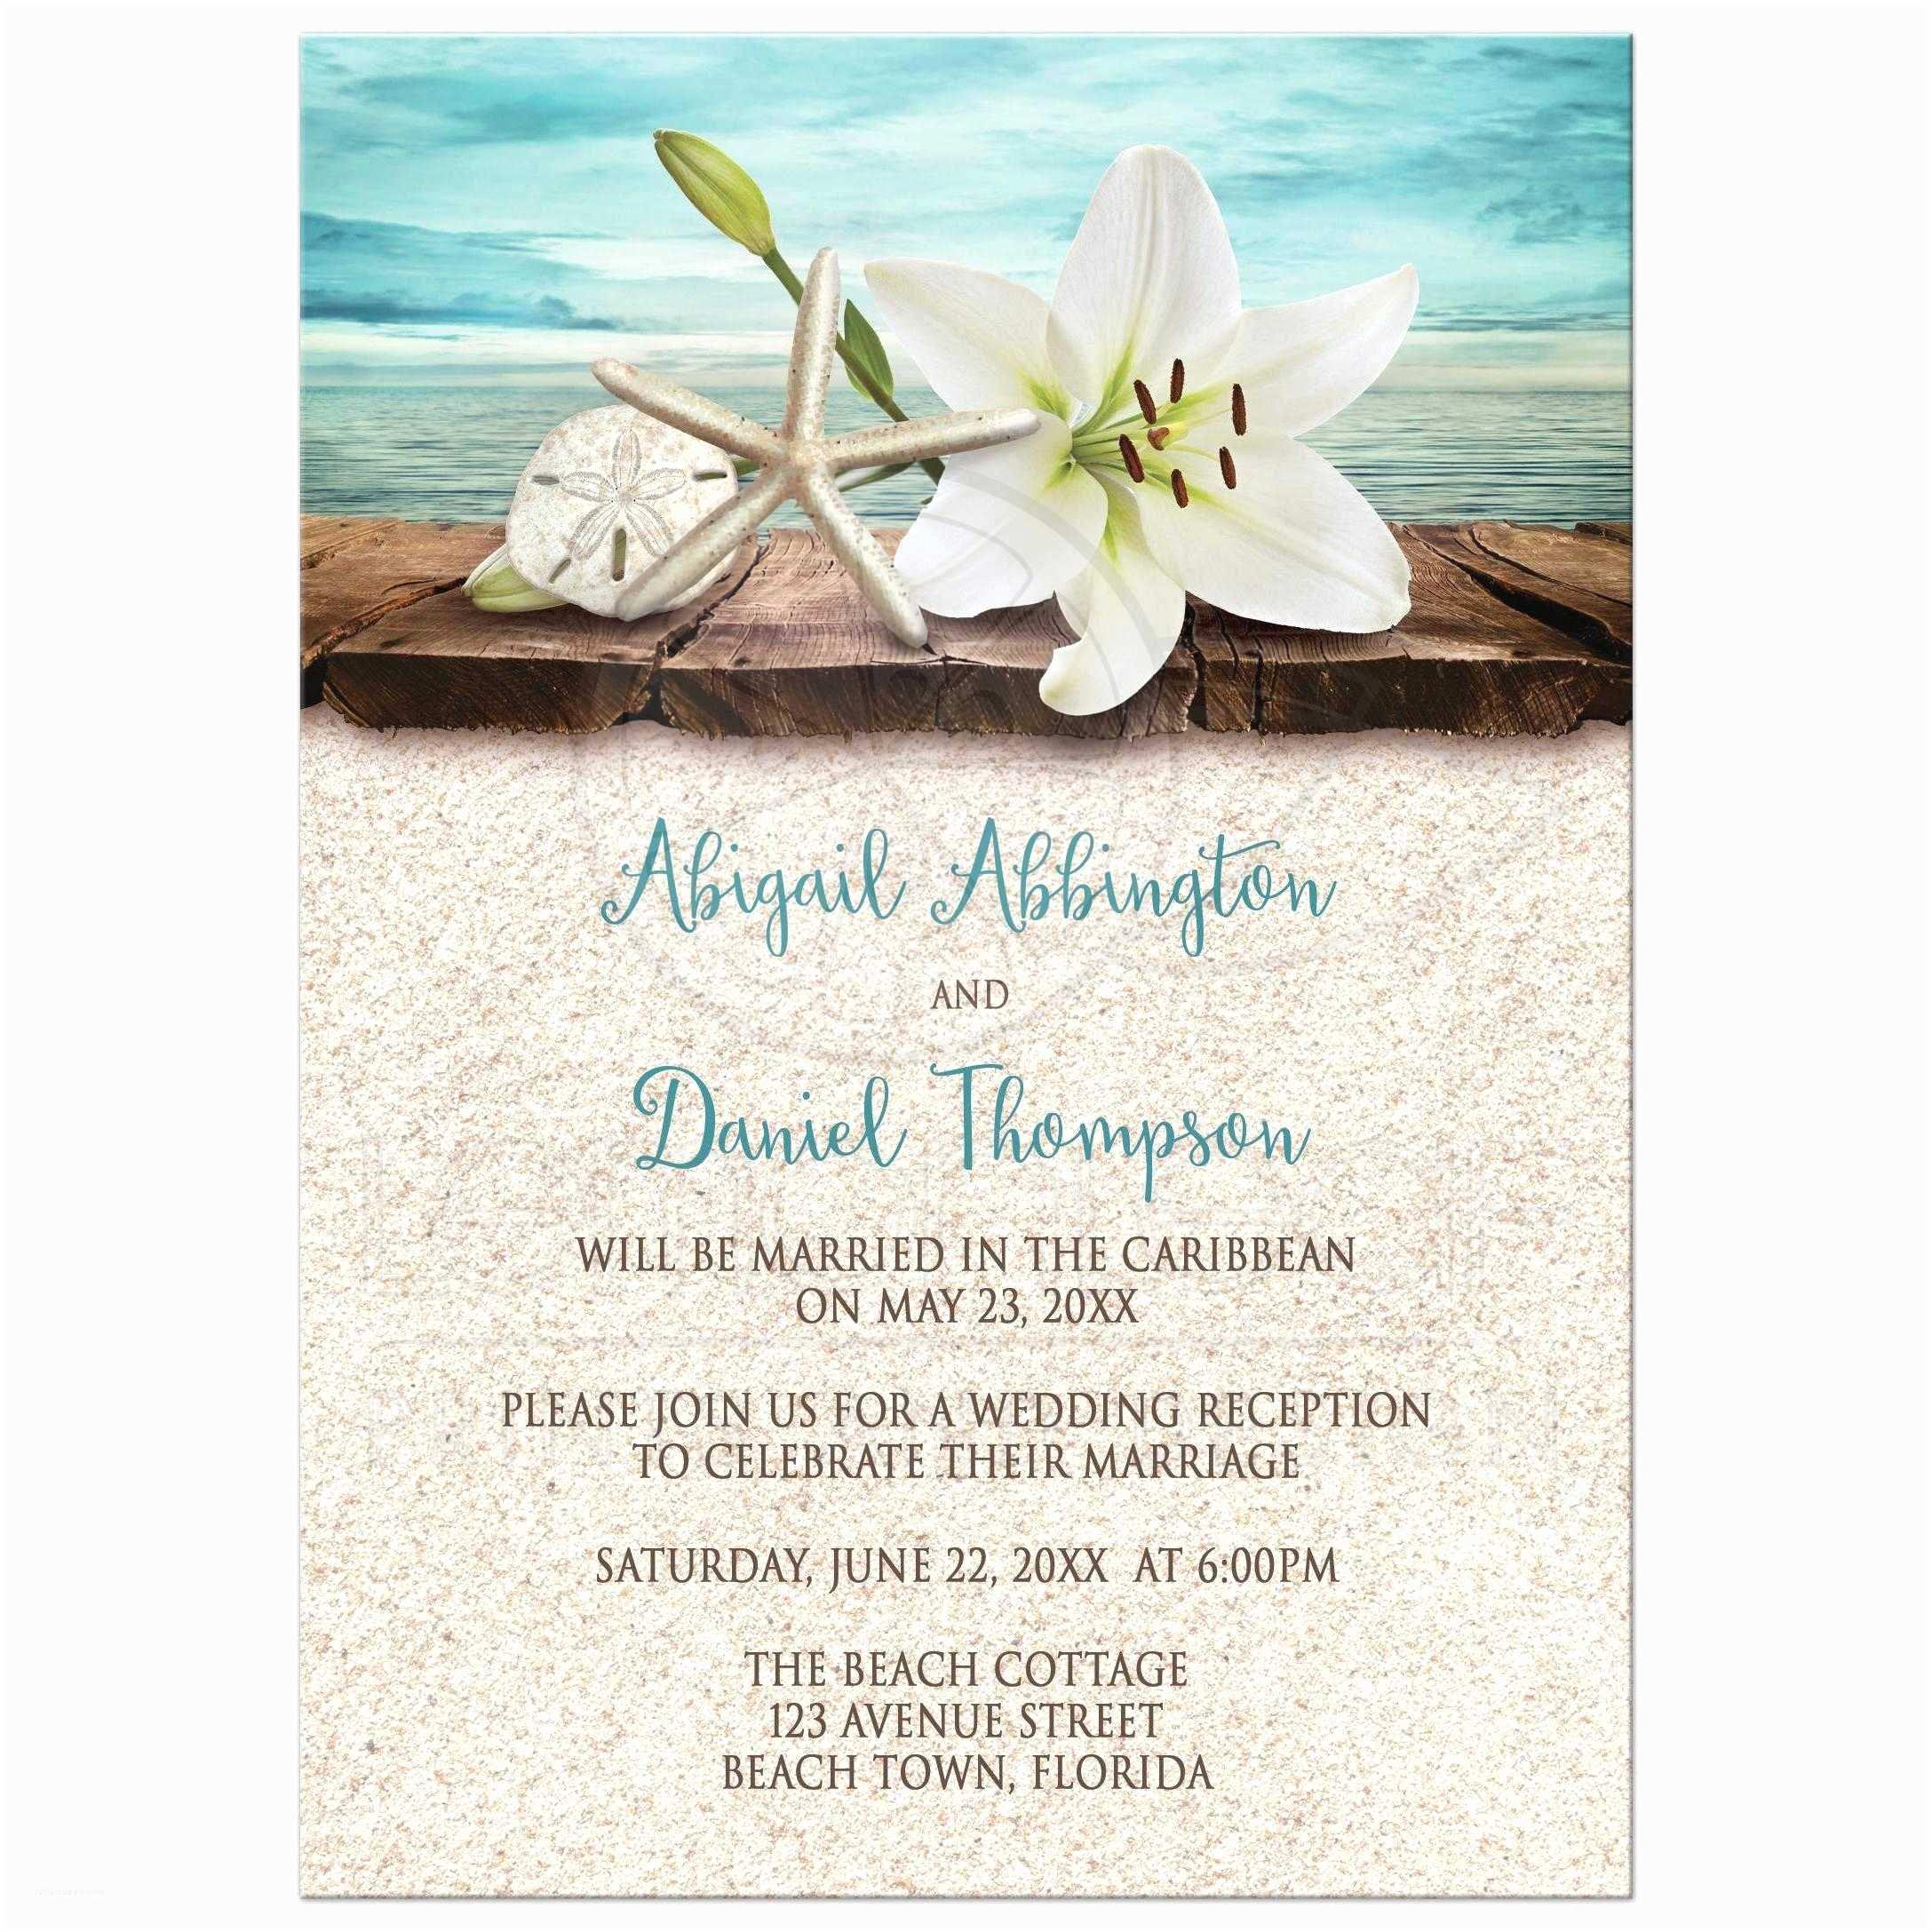 Beach Wedding Invitation Sample Wedding Invitations Beach Reception Invitations Invite